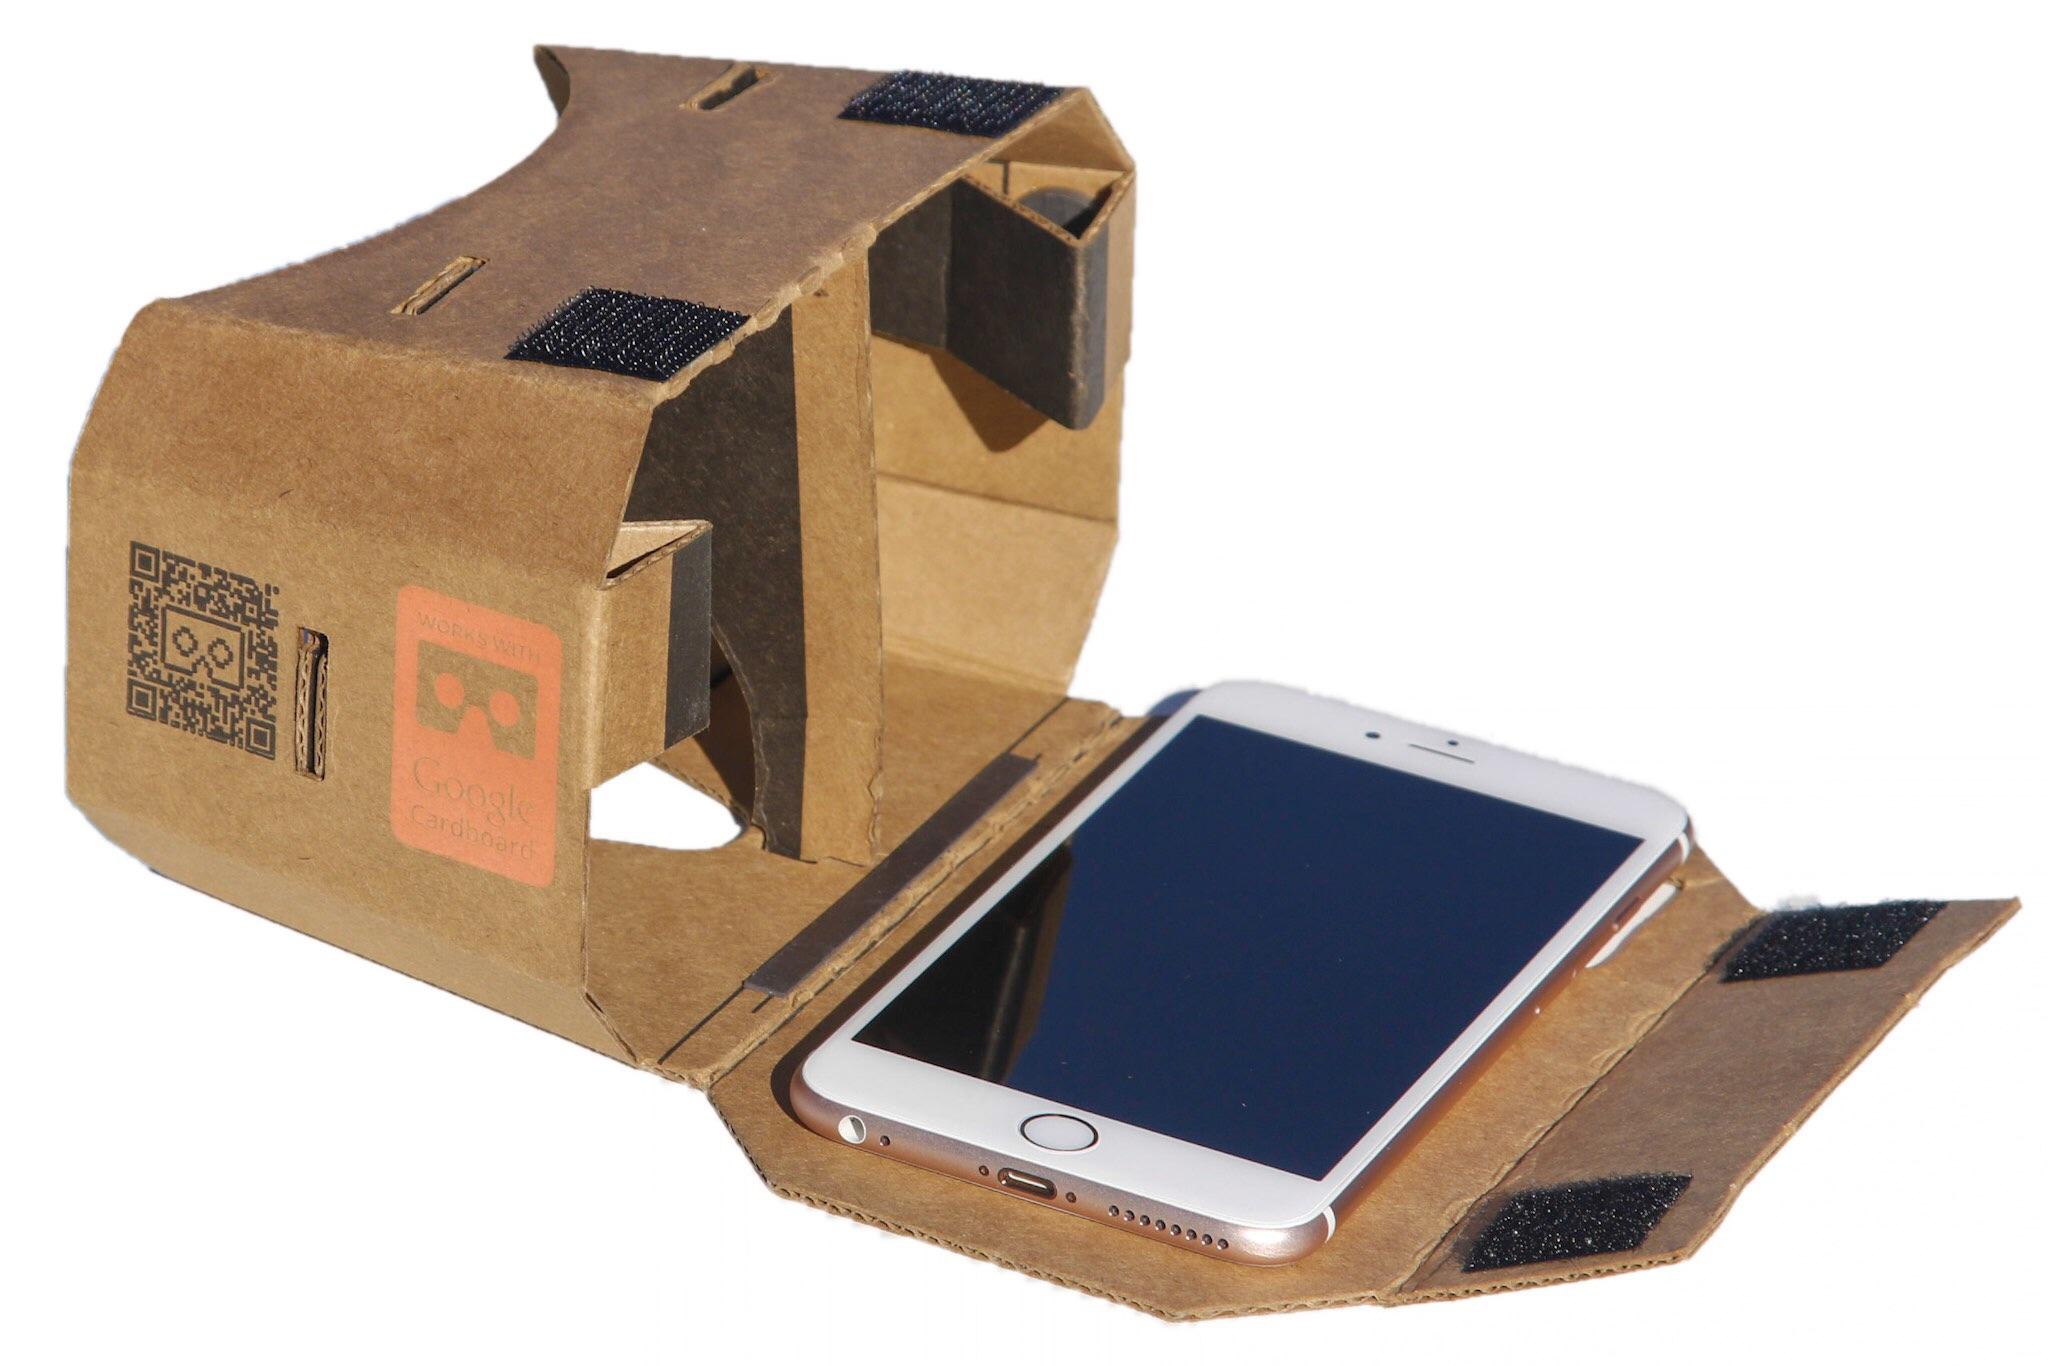 Google_Cardboard_iPhone_6Plus